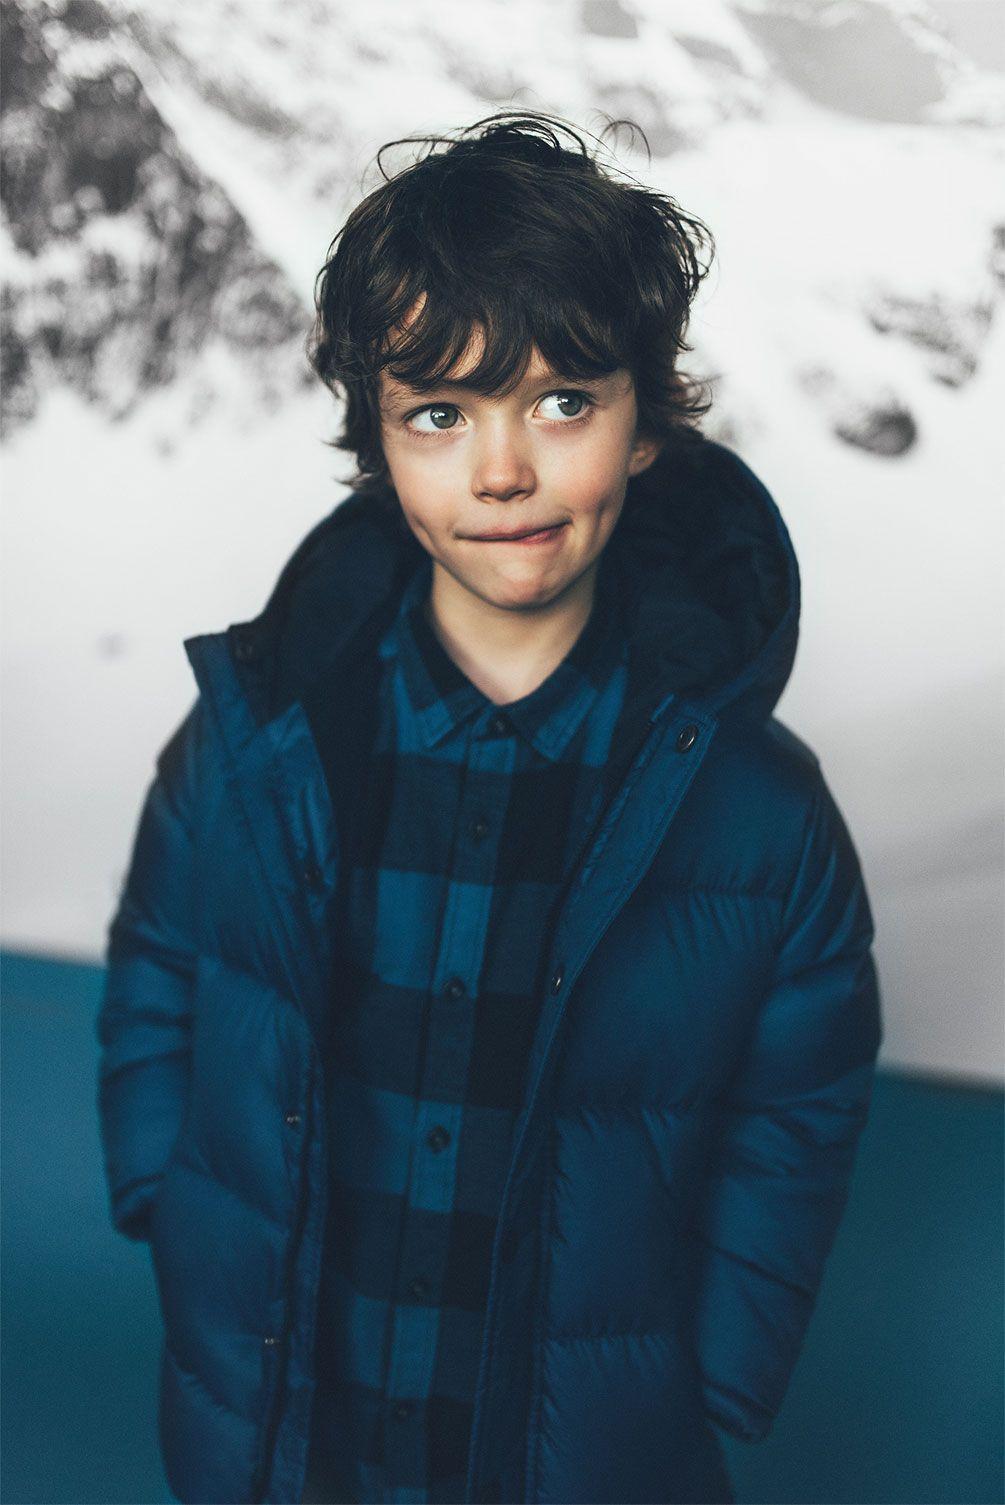 Toddler boy hair long zara  zaraeditorial  editorials  cold days  kids  m o d e